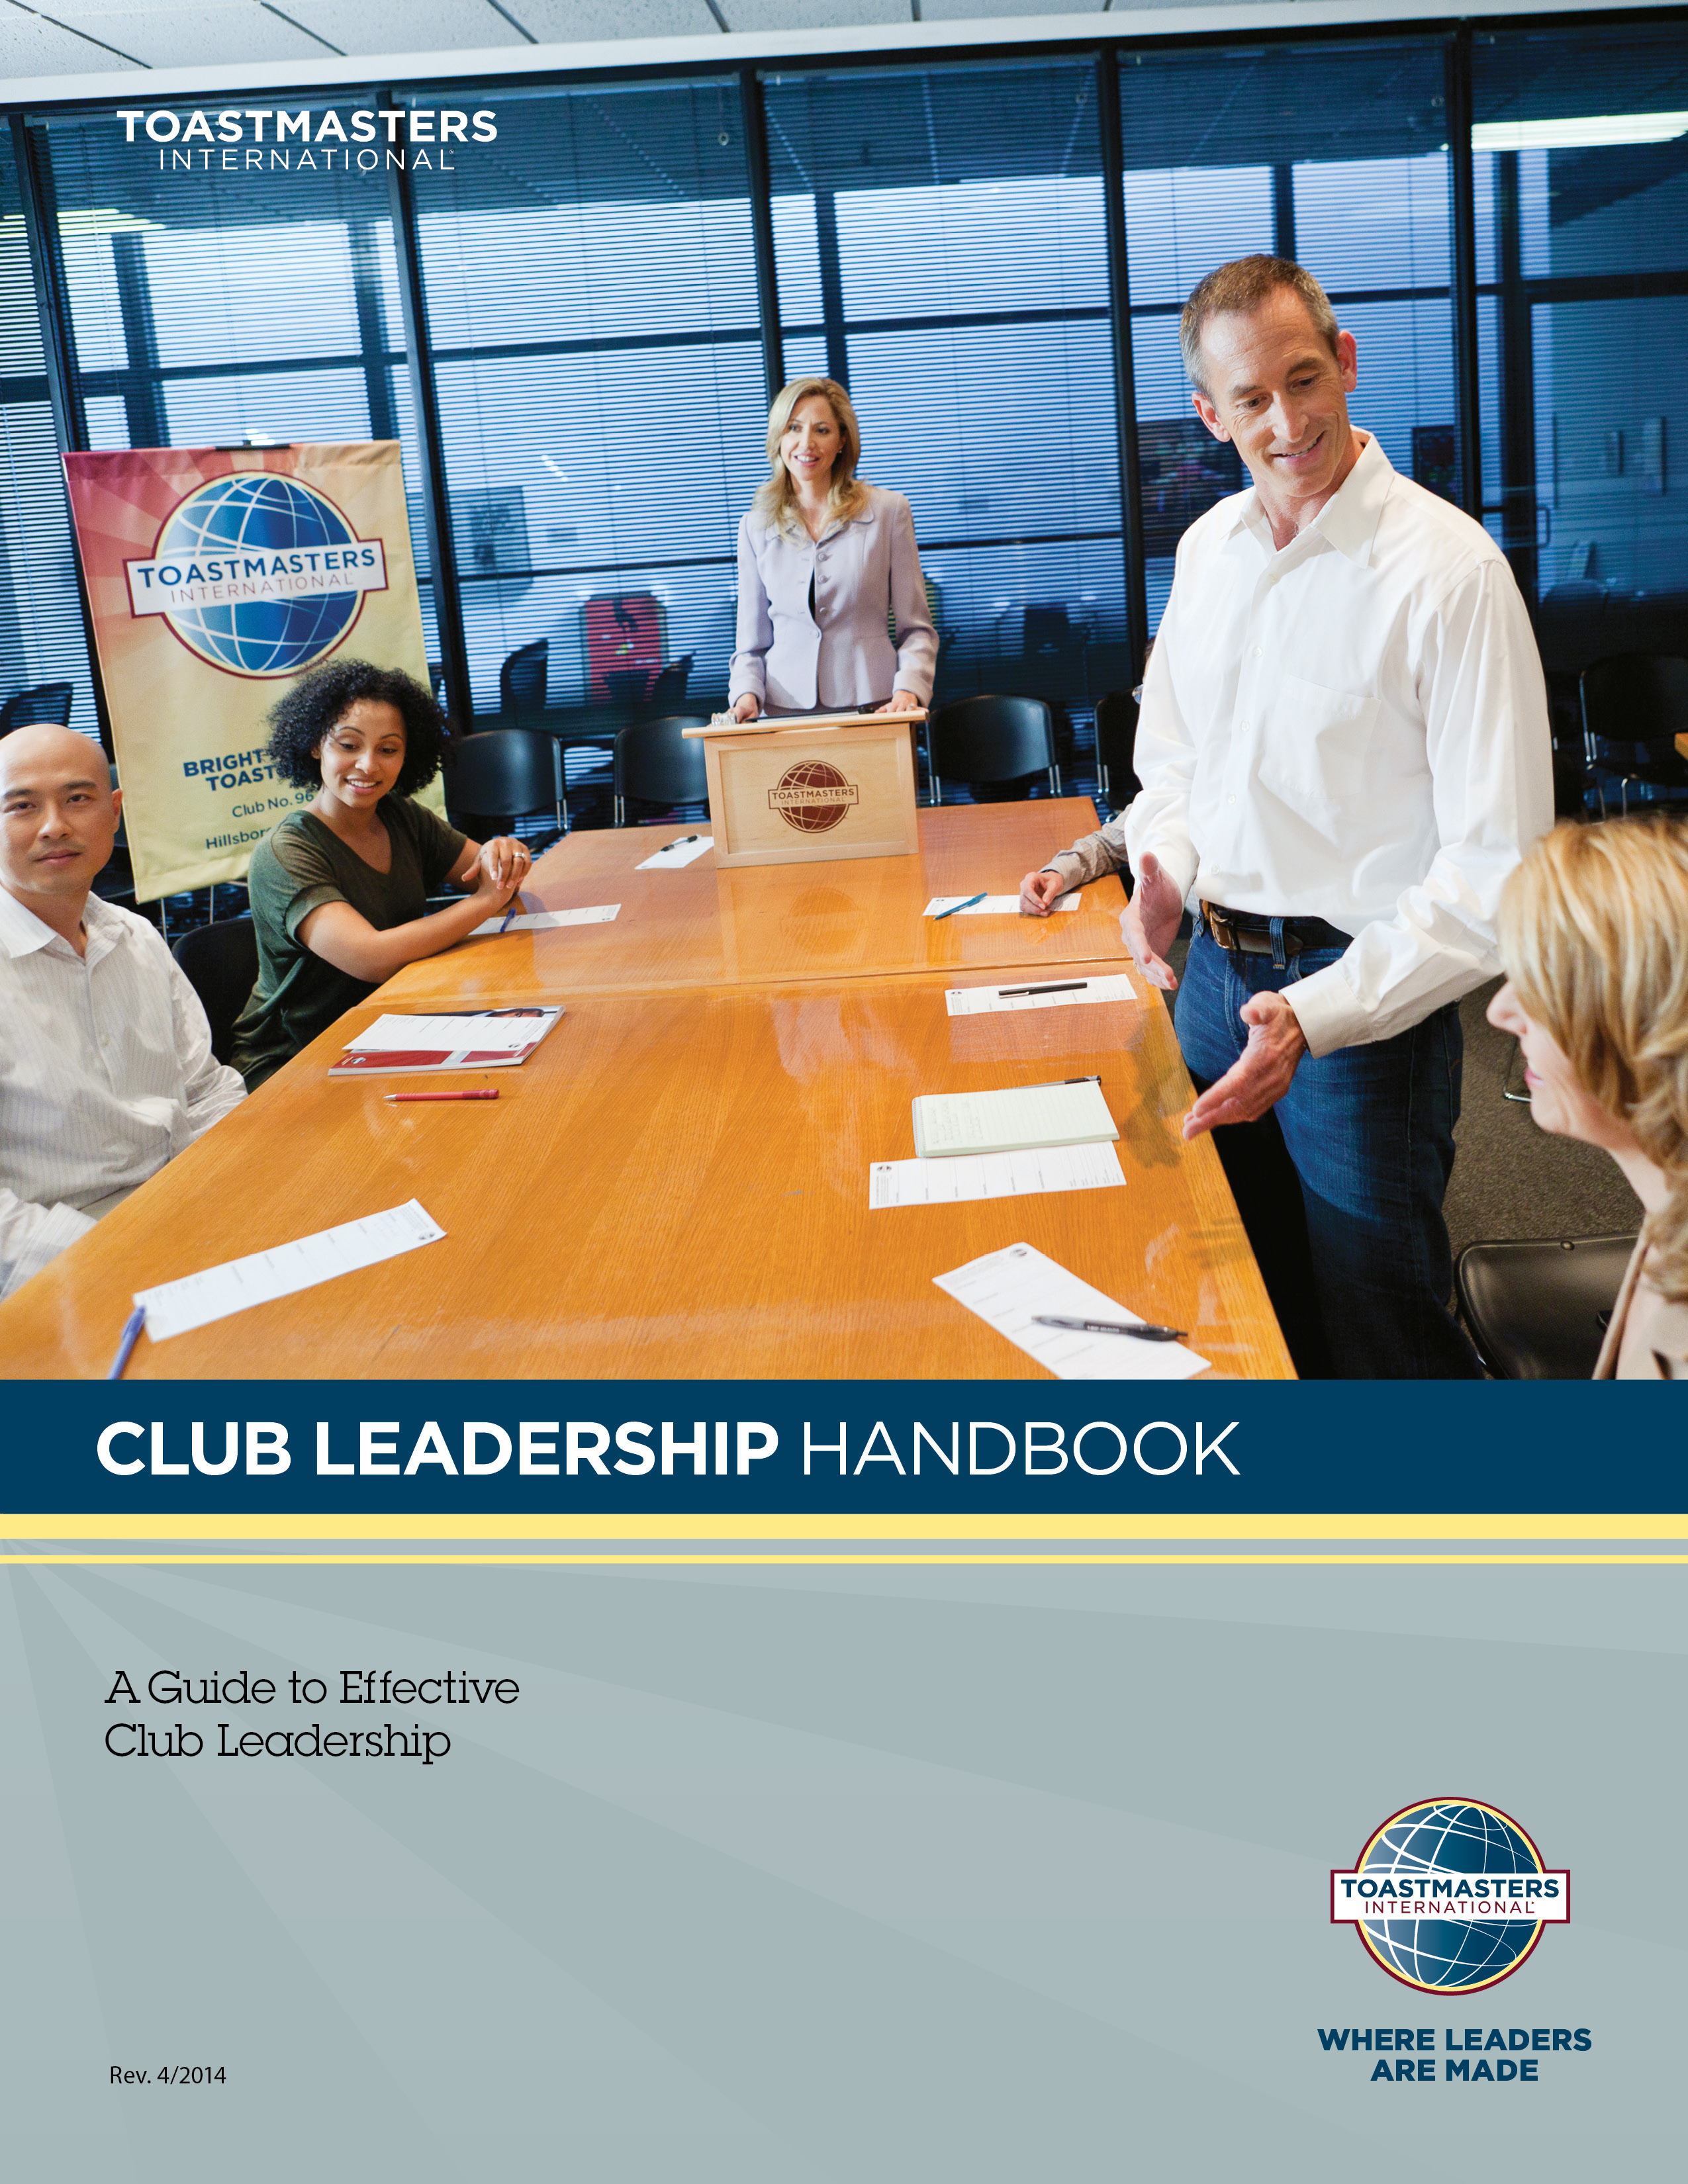 Club Leadership Handbook